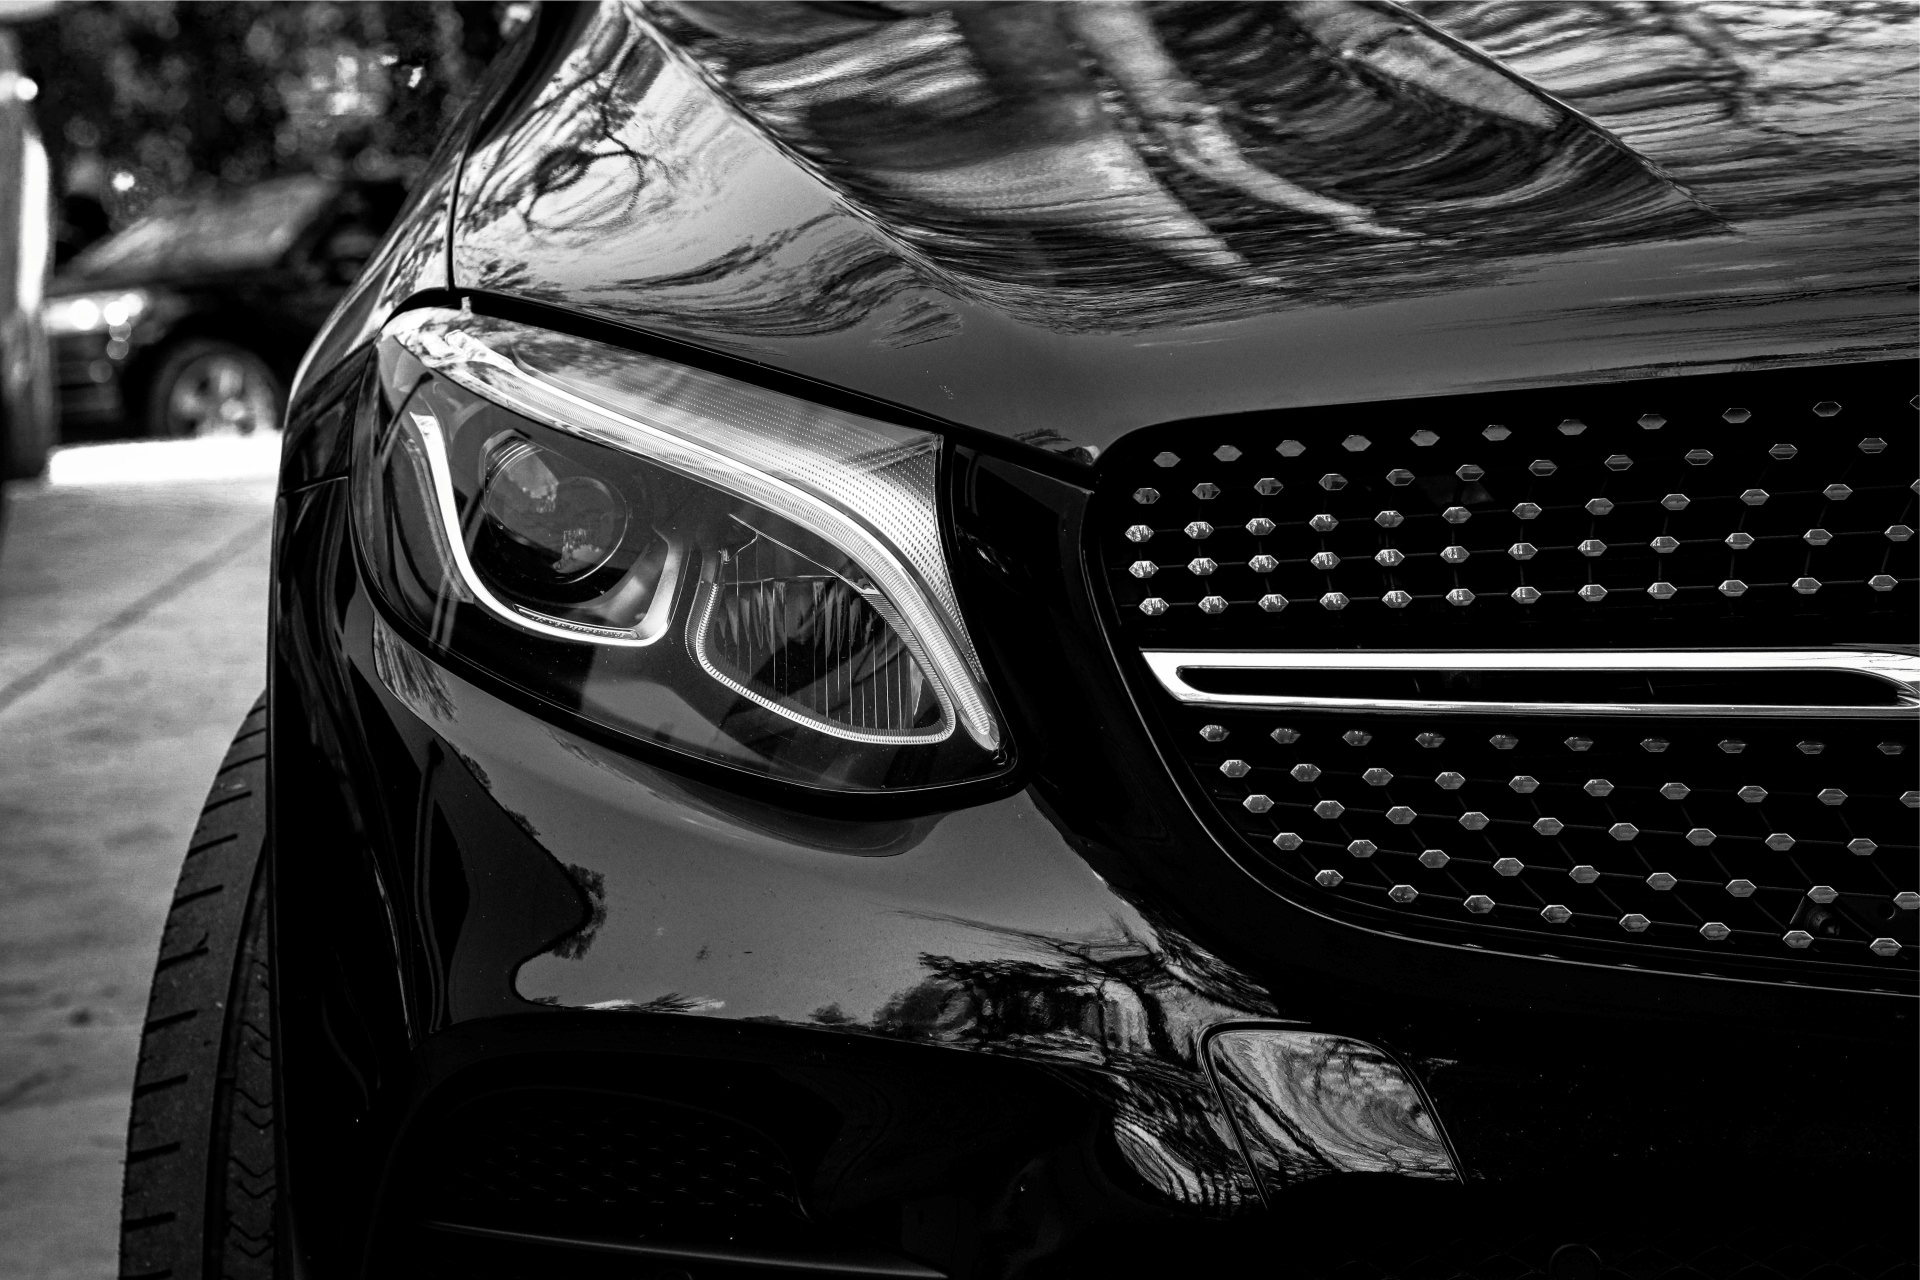 Rent a Car Lux - Ljubuški, Međugorje 2